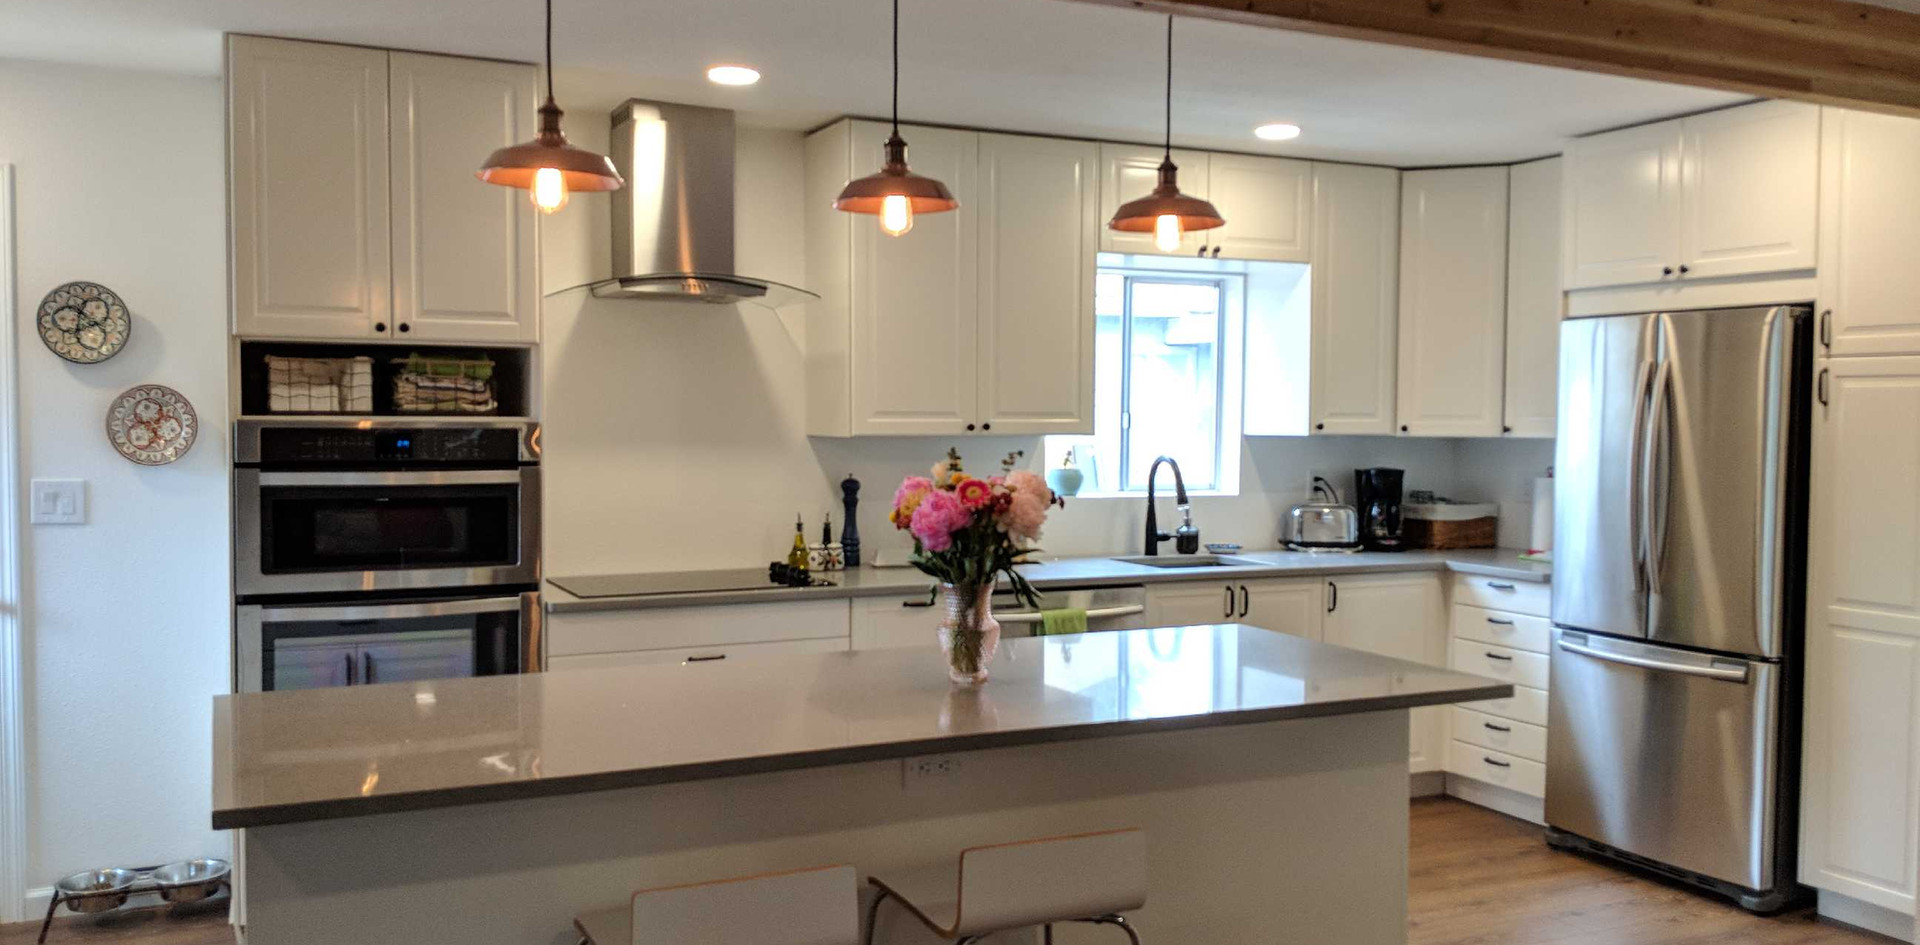 Wygant Kitchen Remodel